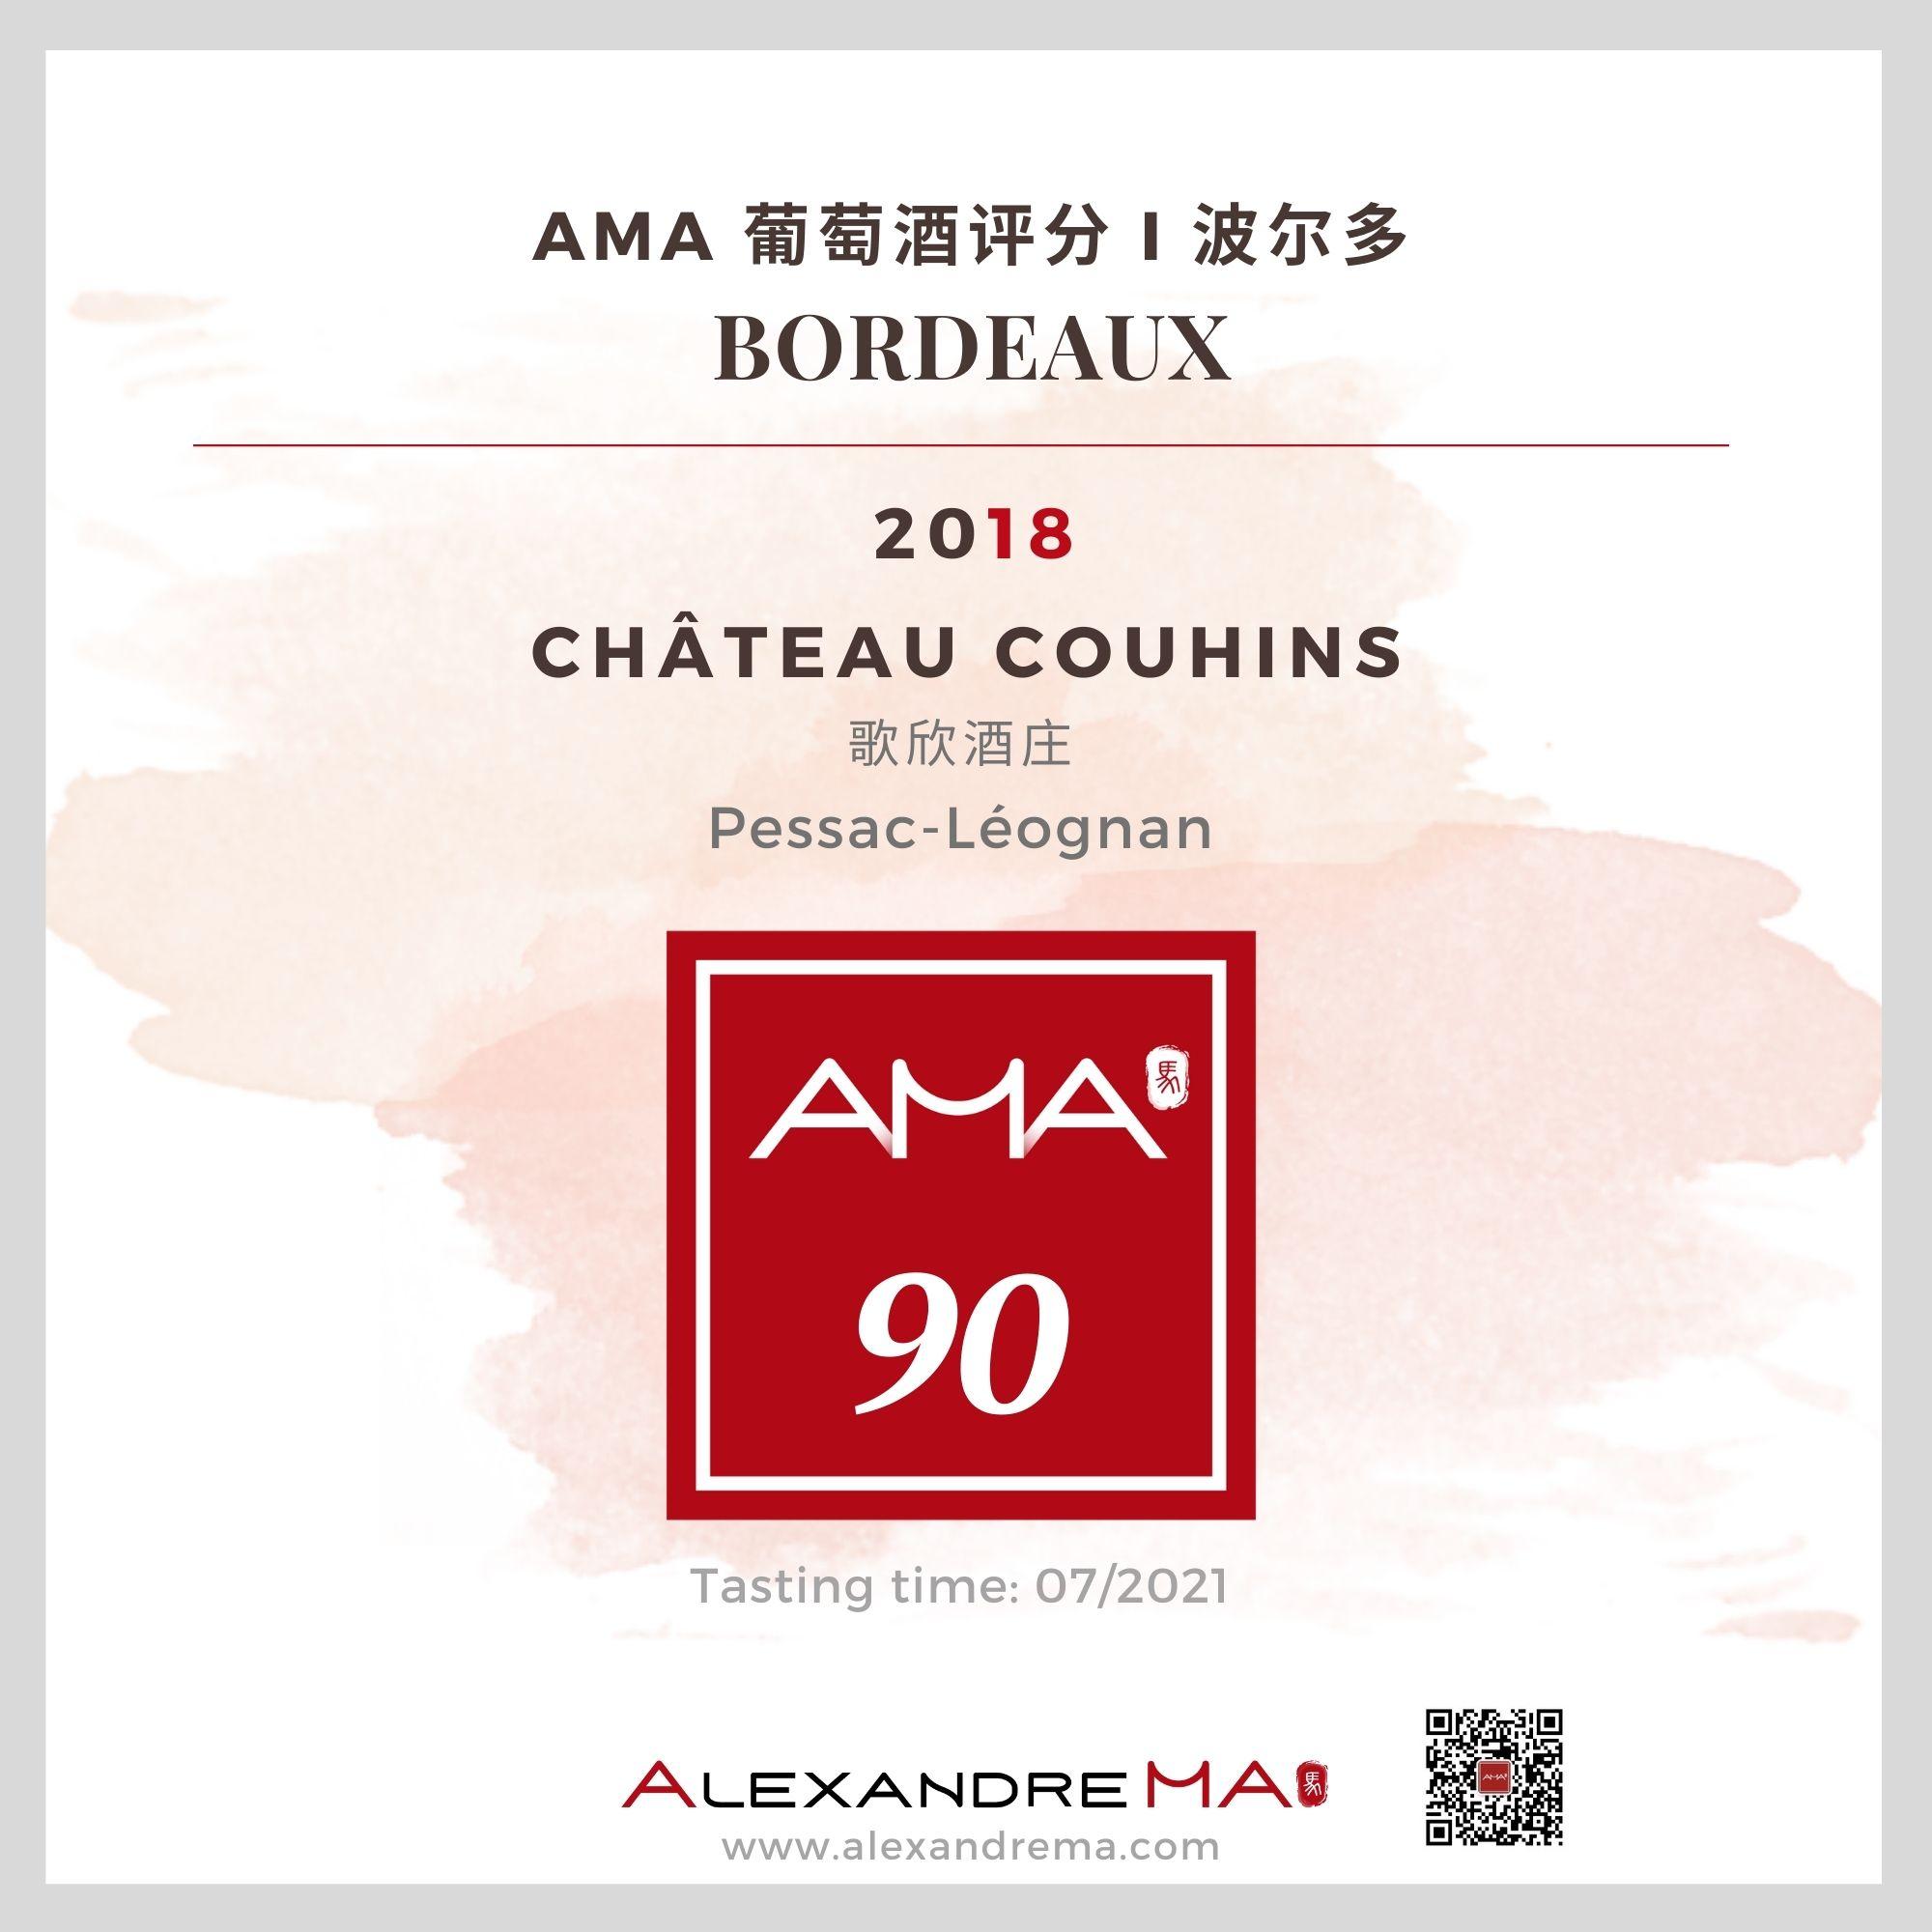 Château Couhins 2018 - Alexandre MA